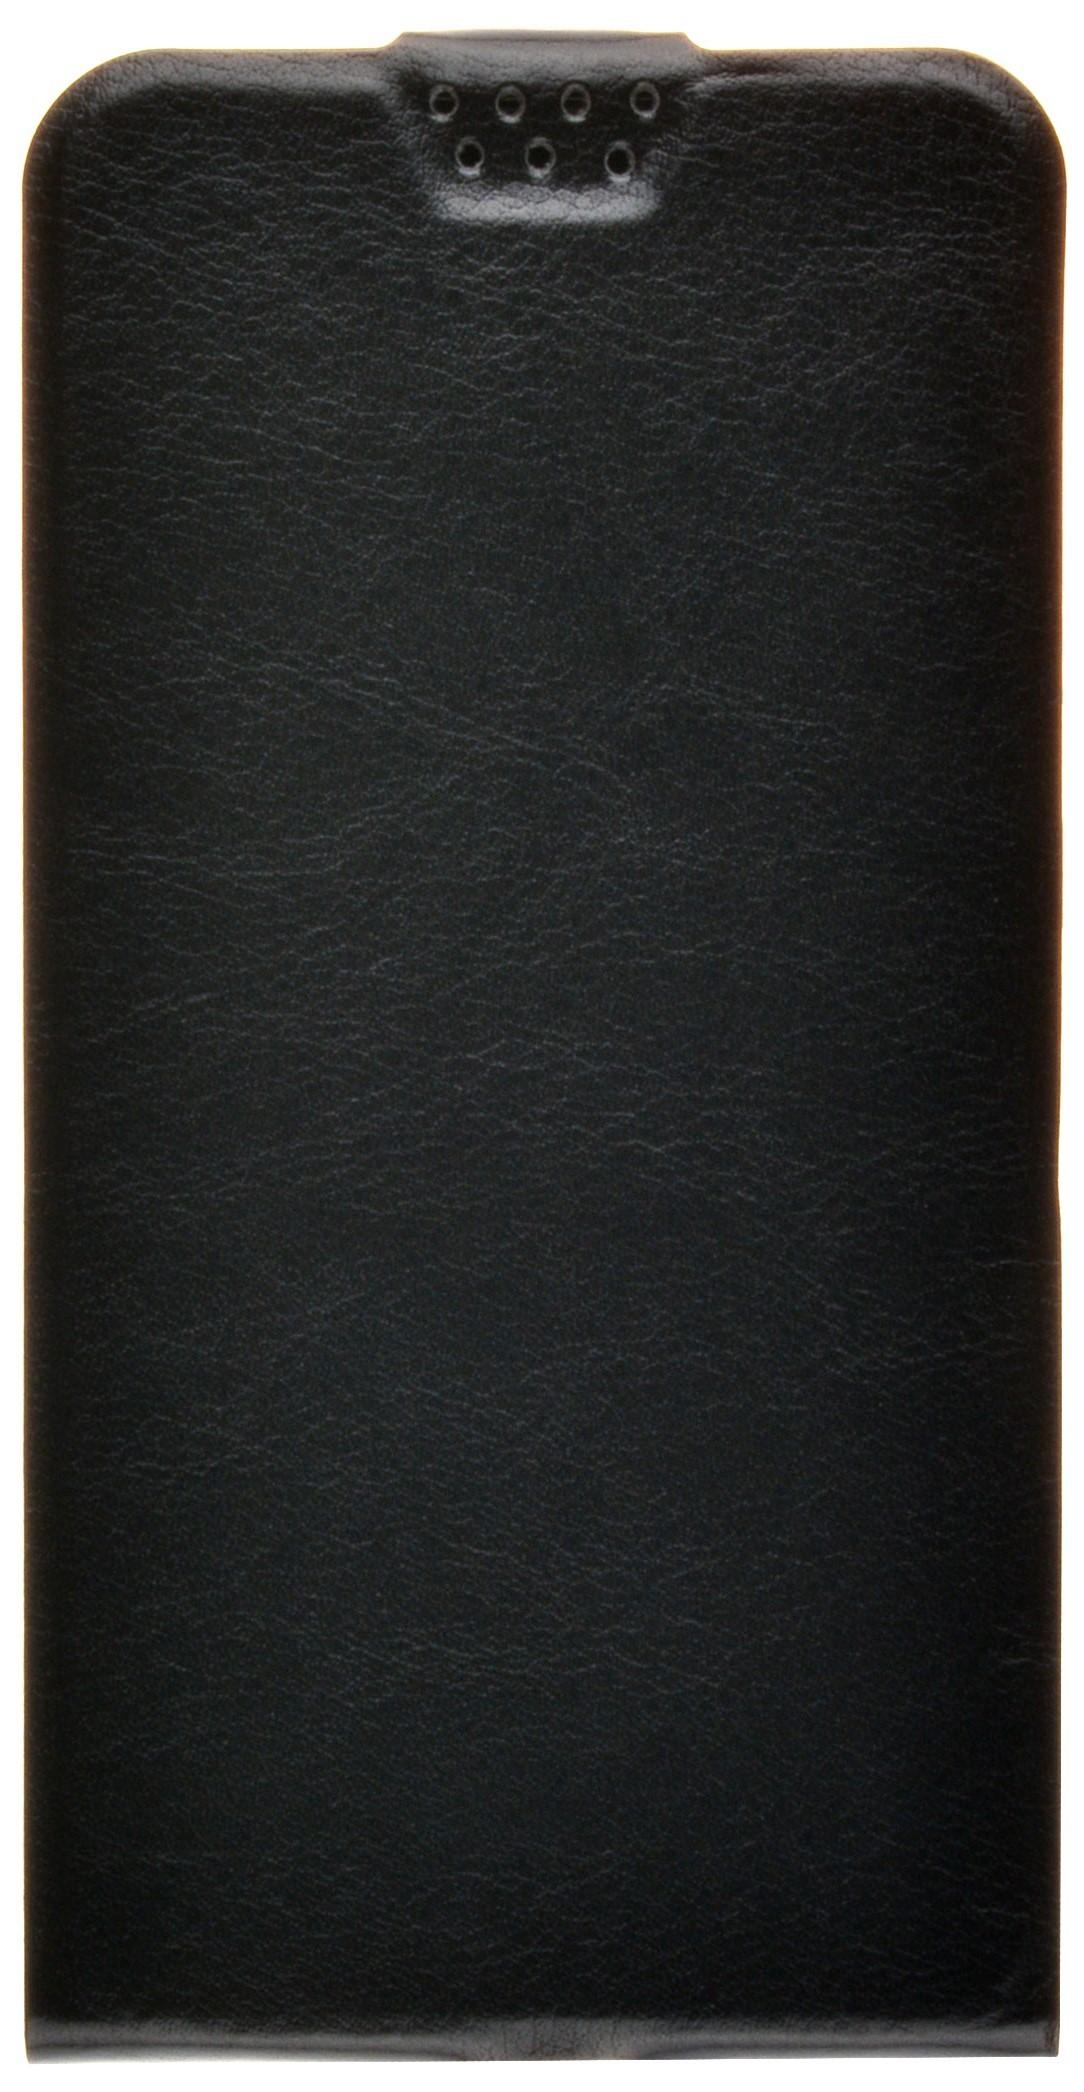 Чехол для сотового телефона skinBOX Flip slim, 4660041407662, черный flip pu leather protective stand case cover for zte blade l2